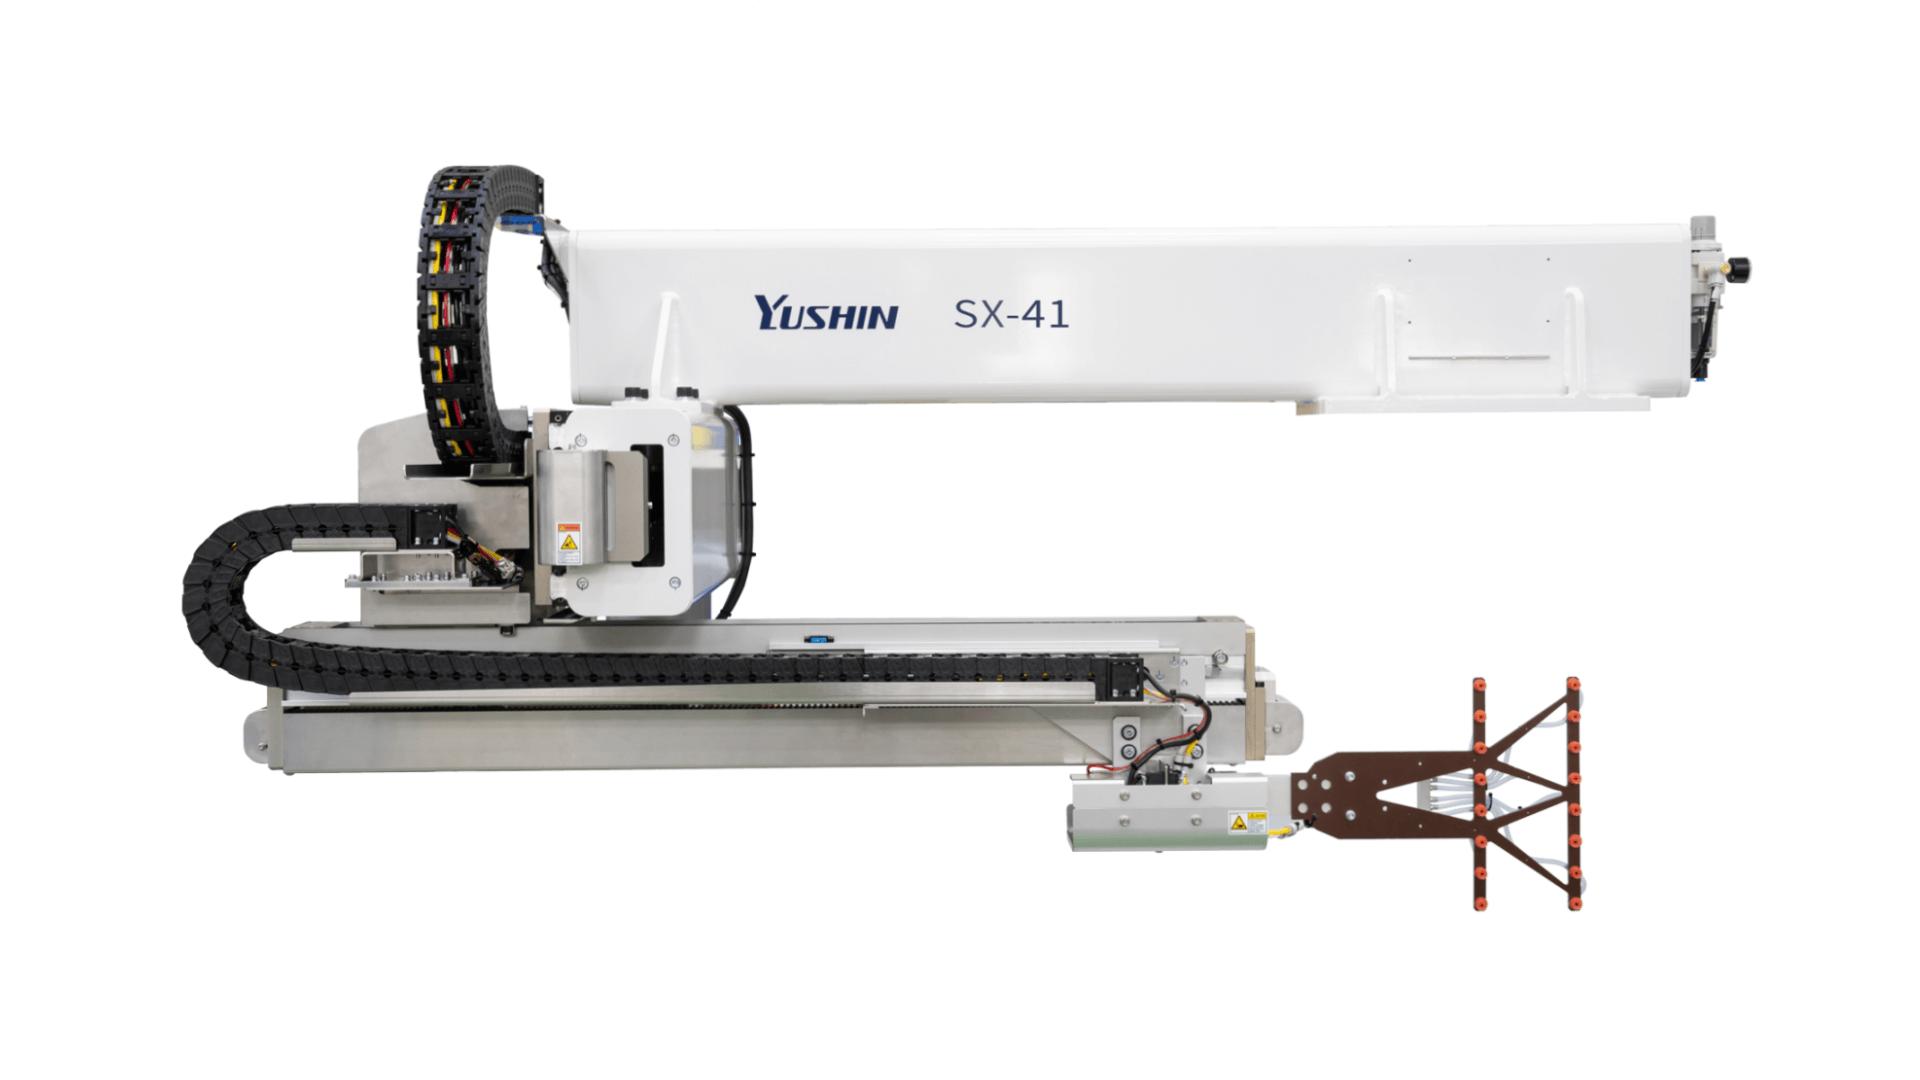 SX-41 medical robot